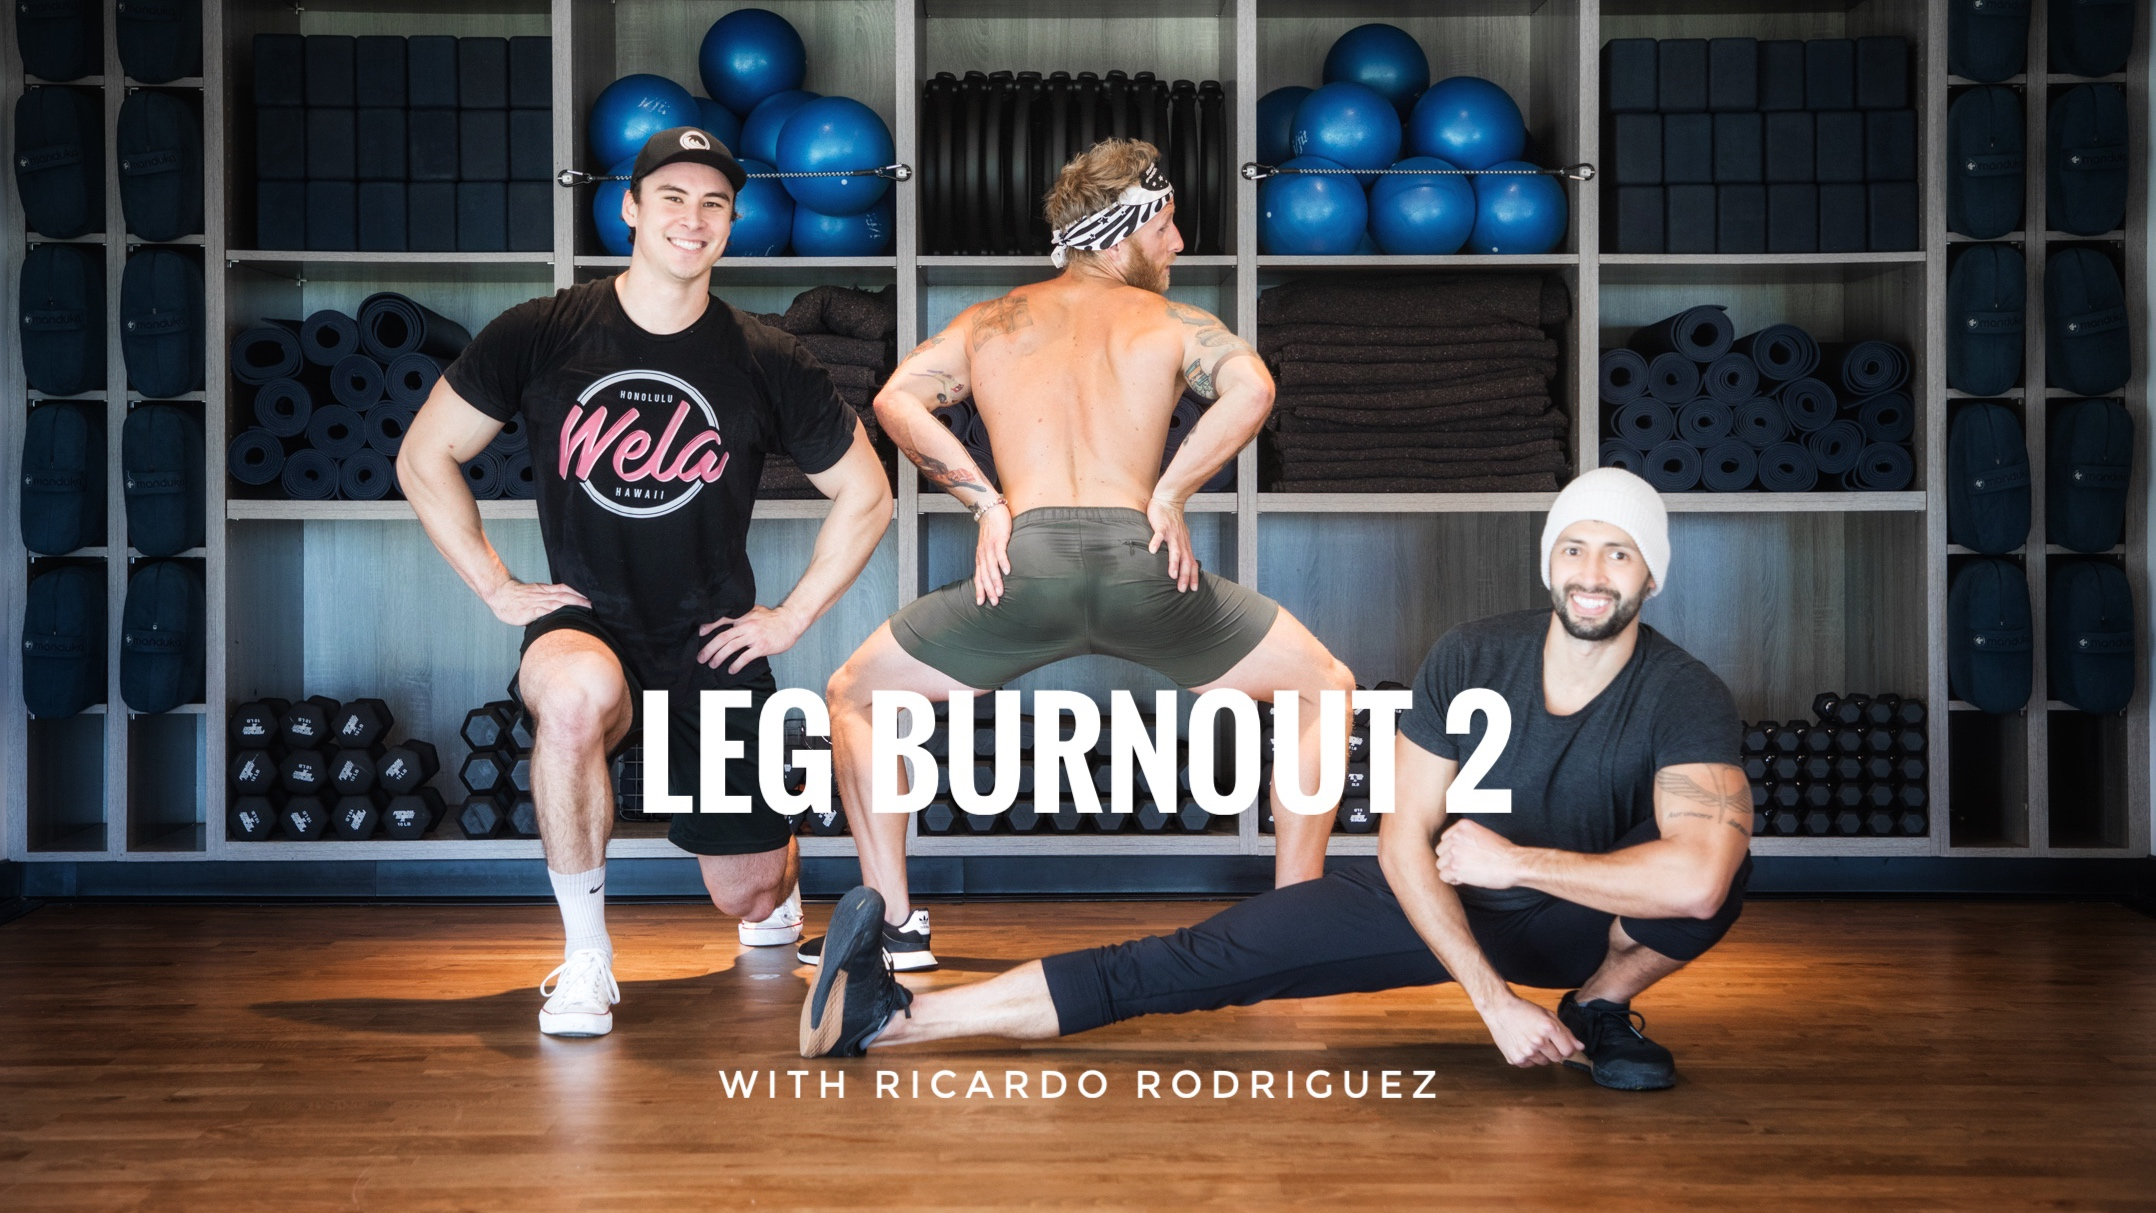 Leg Burnout 2 with Ricardo Rodriguez